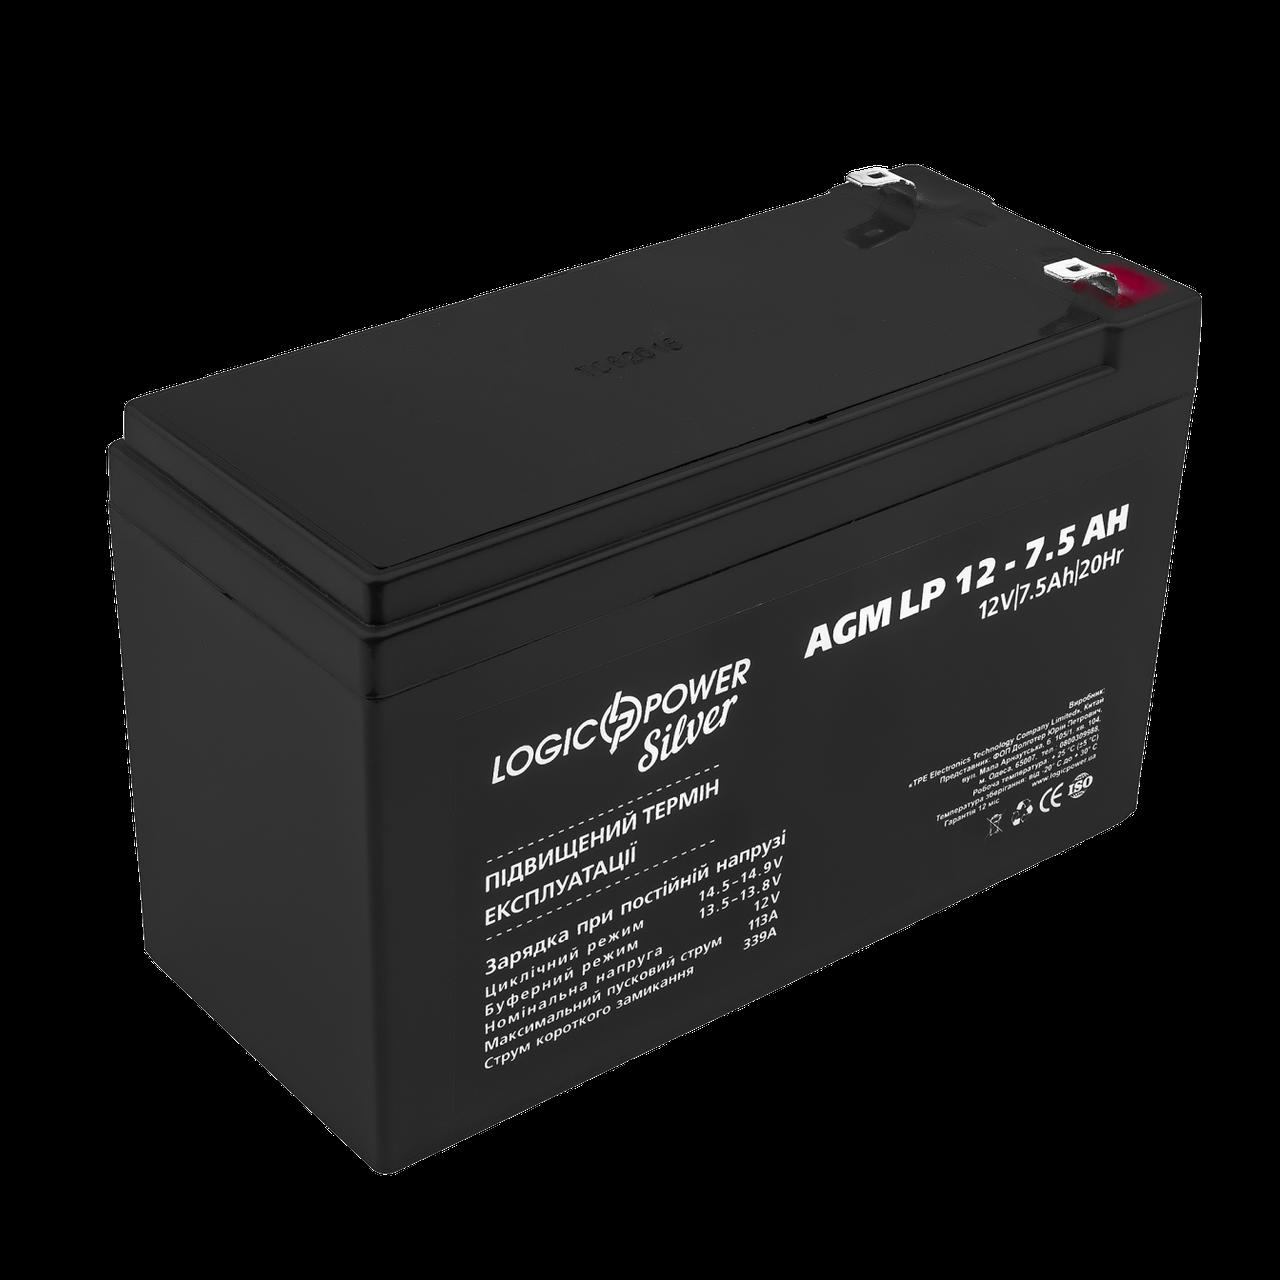 Аккумулятор кислотный AGM LogicPower LP 12 - 7,5 AH